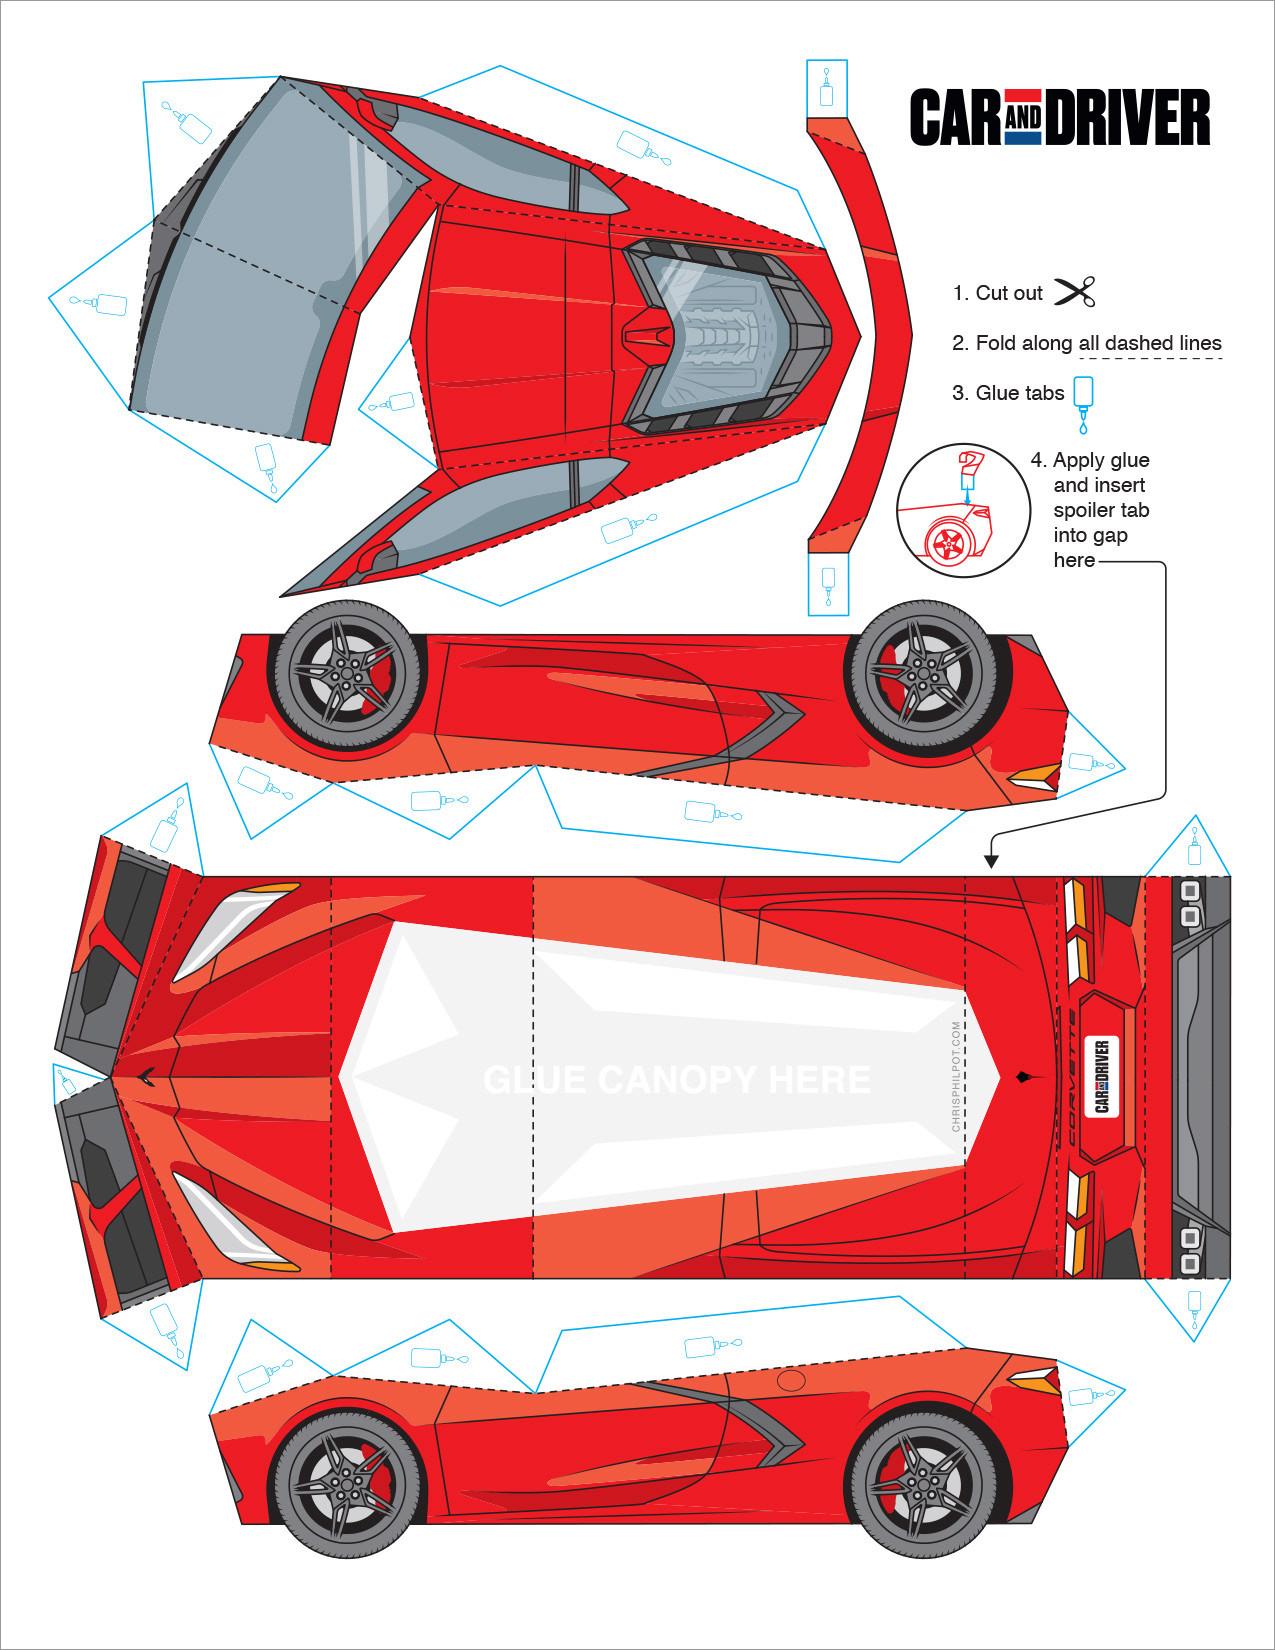 Papercraft Car Red Chris Philpot C8 Corvette Car Papercraft